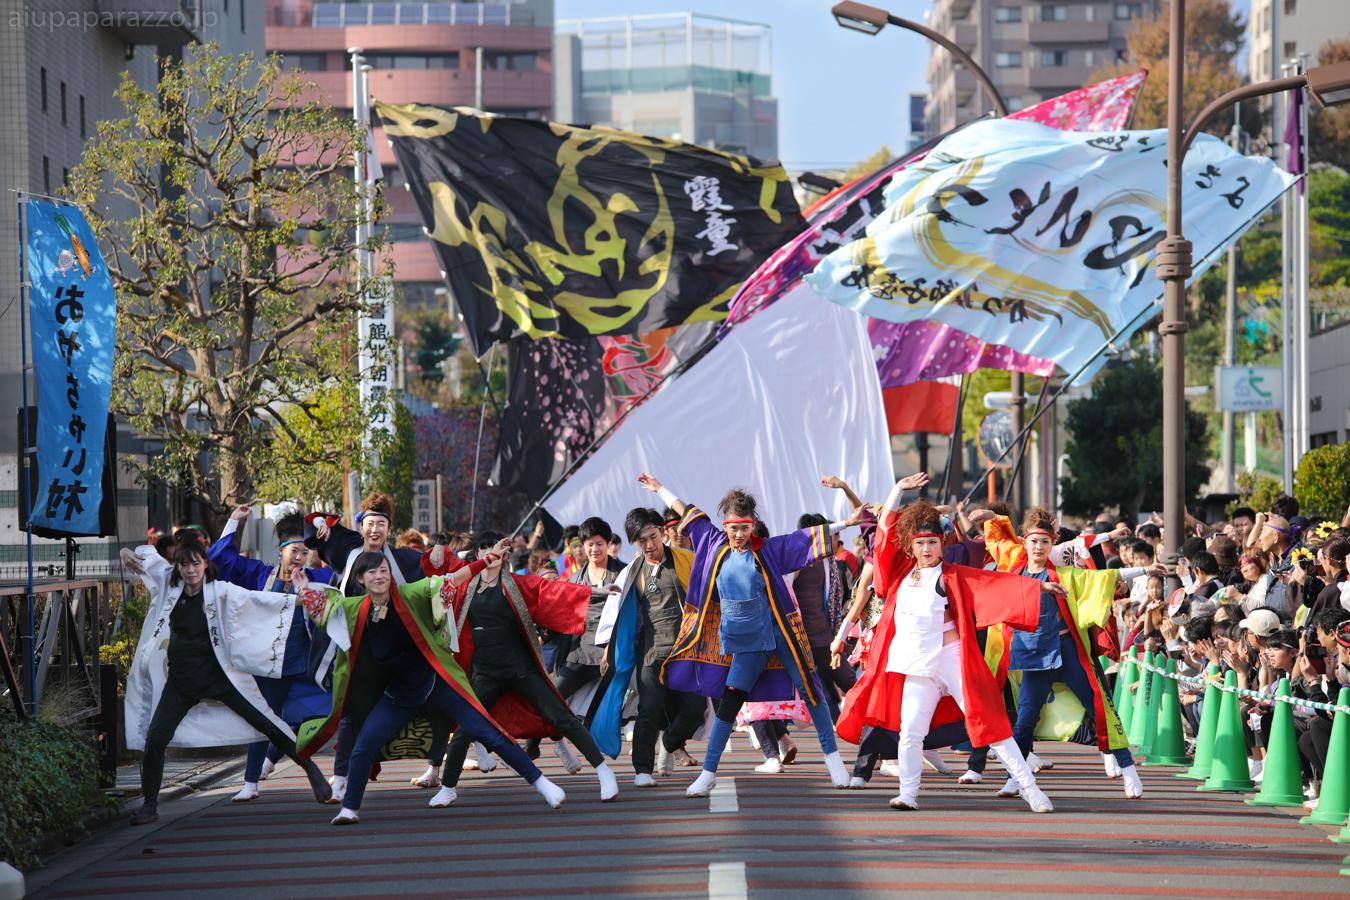 kanpachi2016oyachai-5.jpg